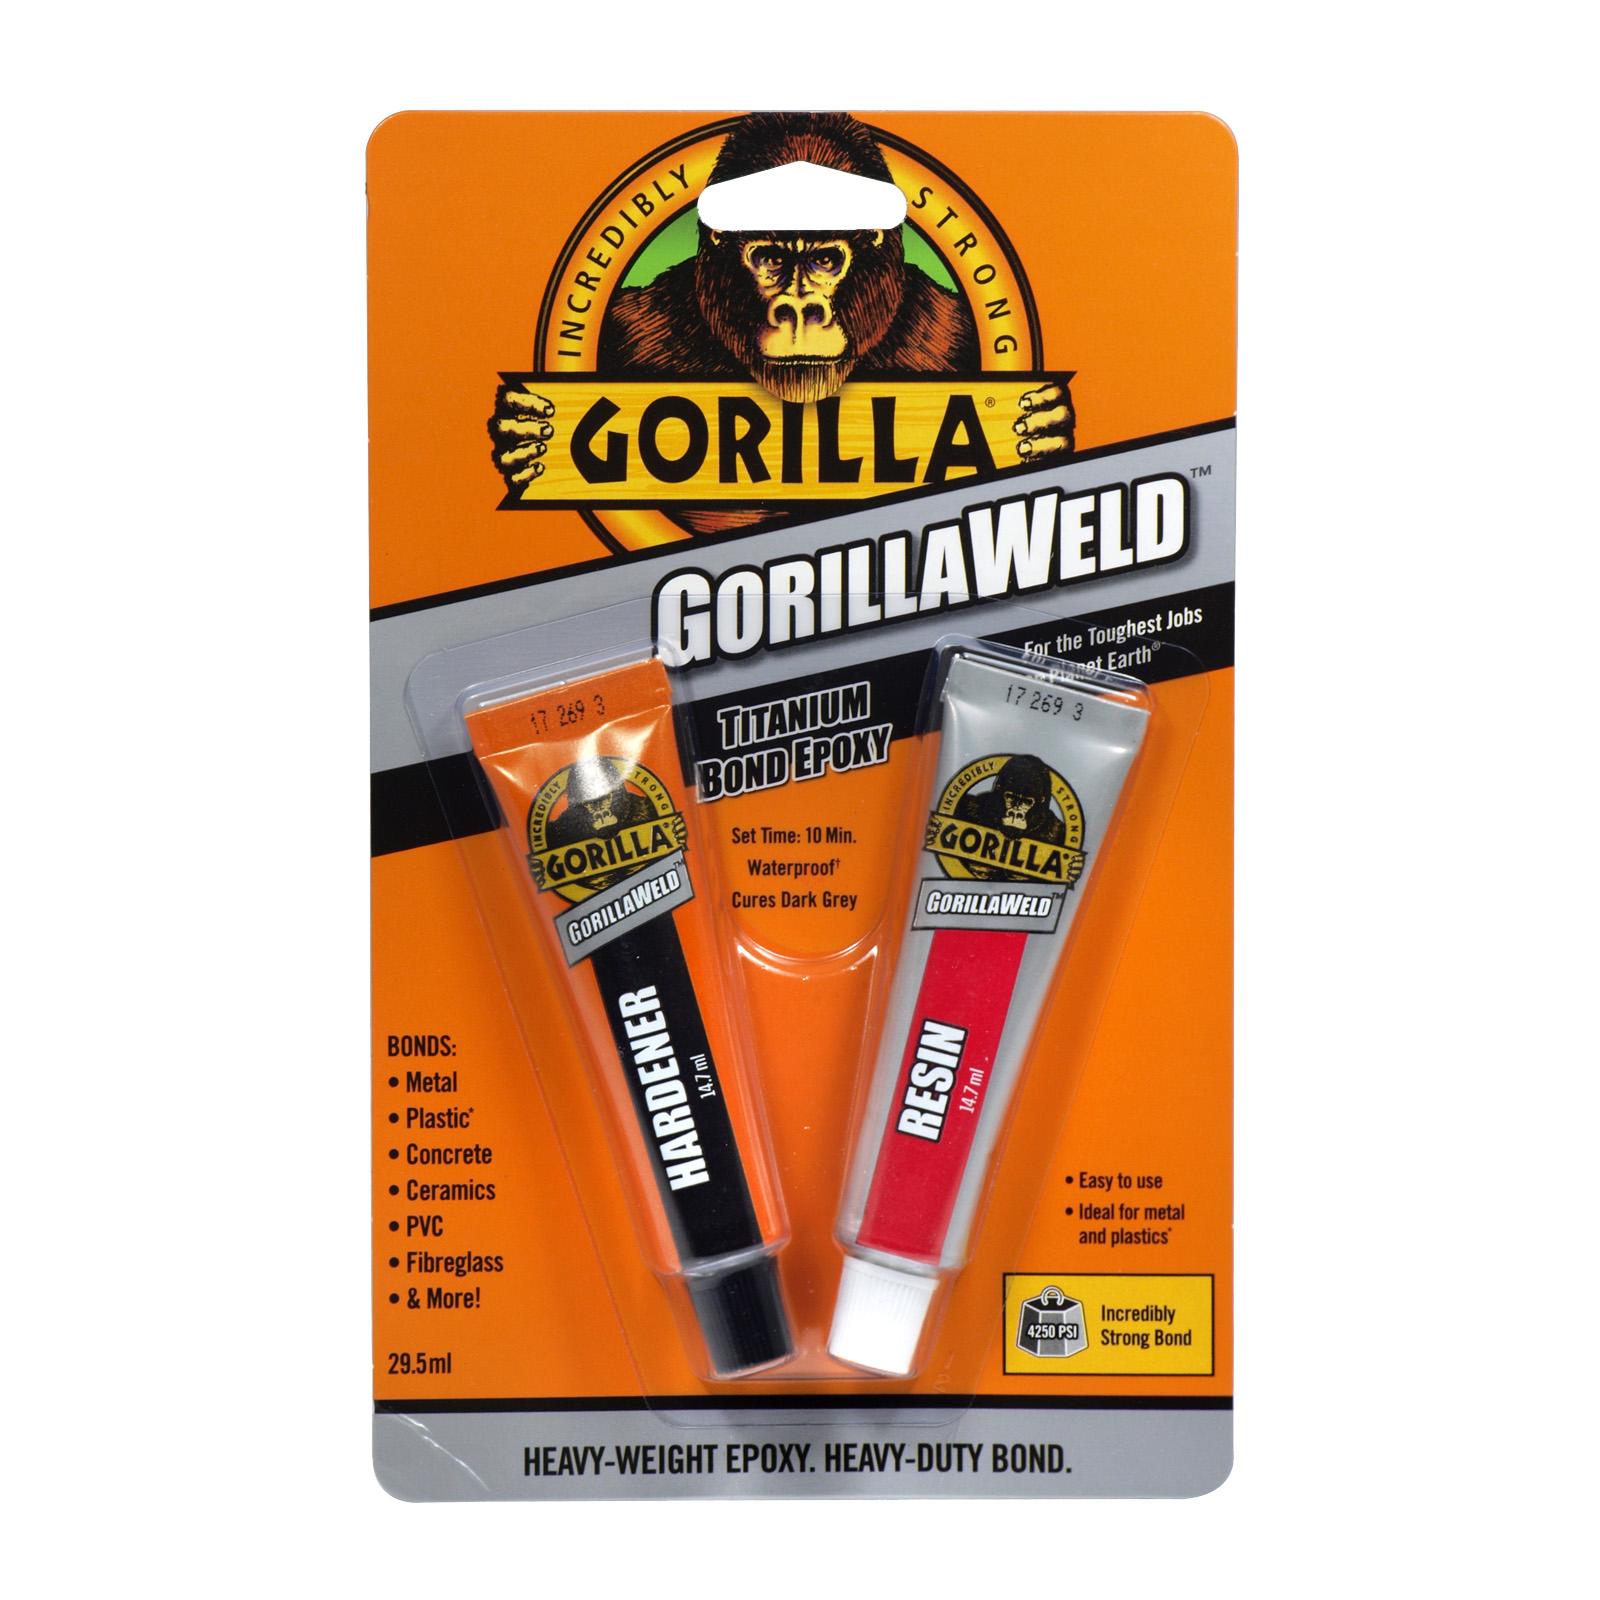 GORILLA WELD 2X14.7MLTITANIUM EPOXY BOND